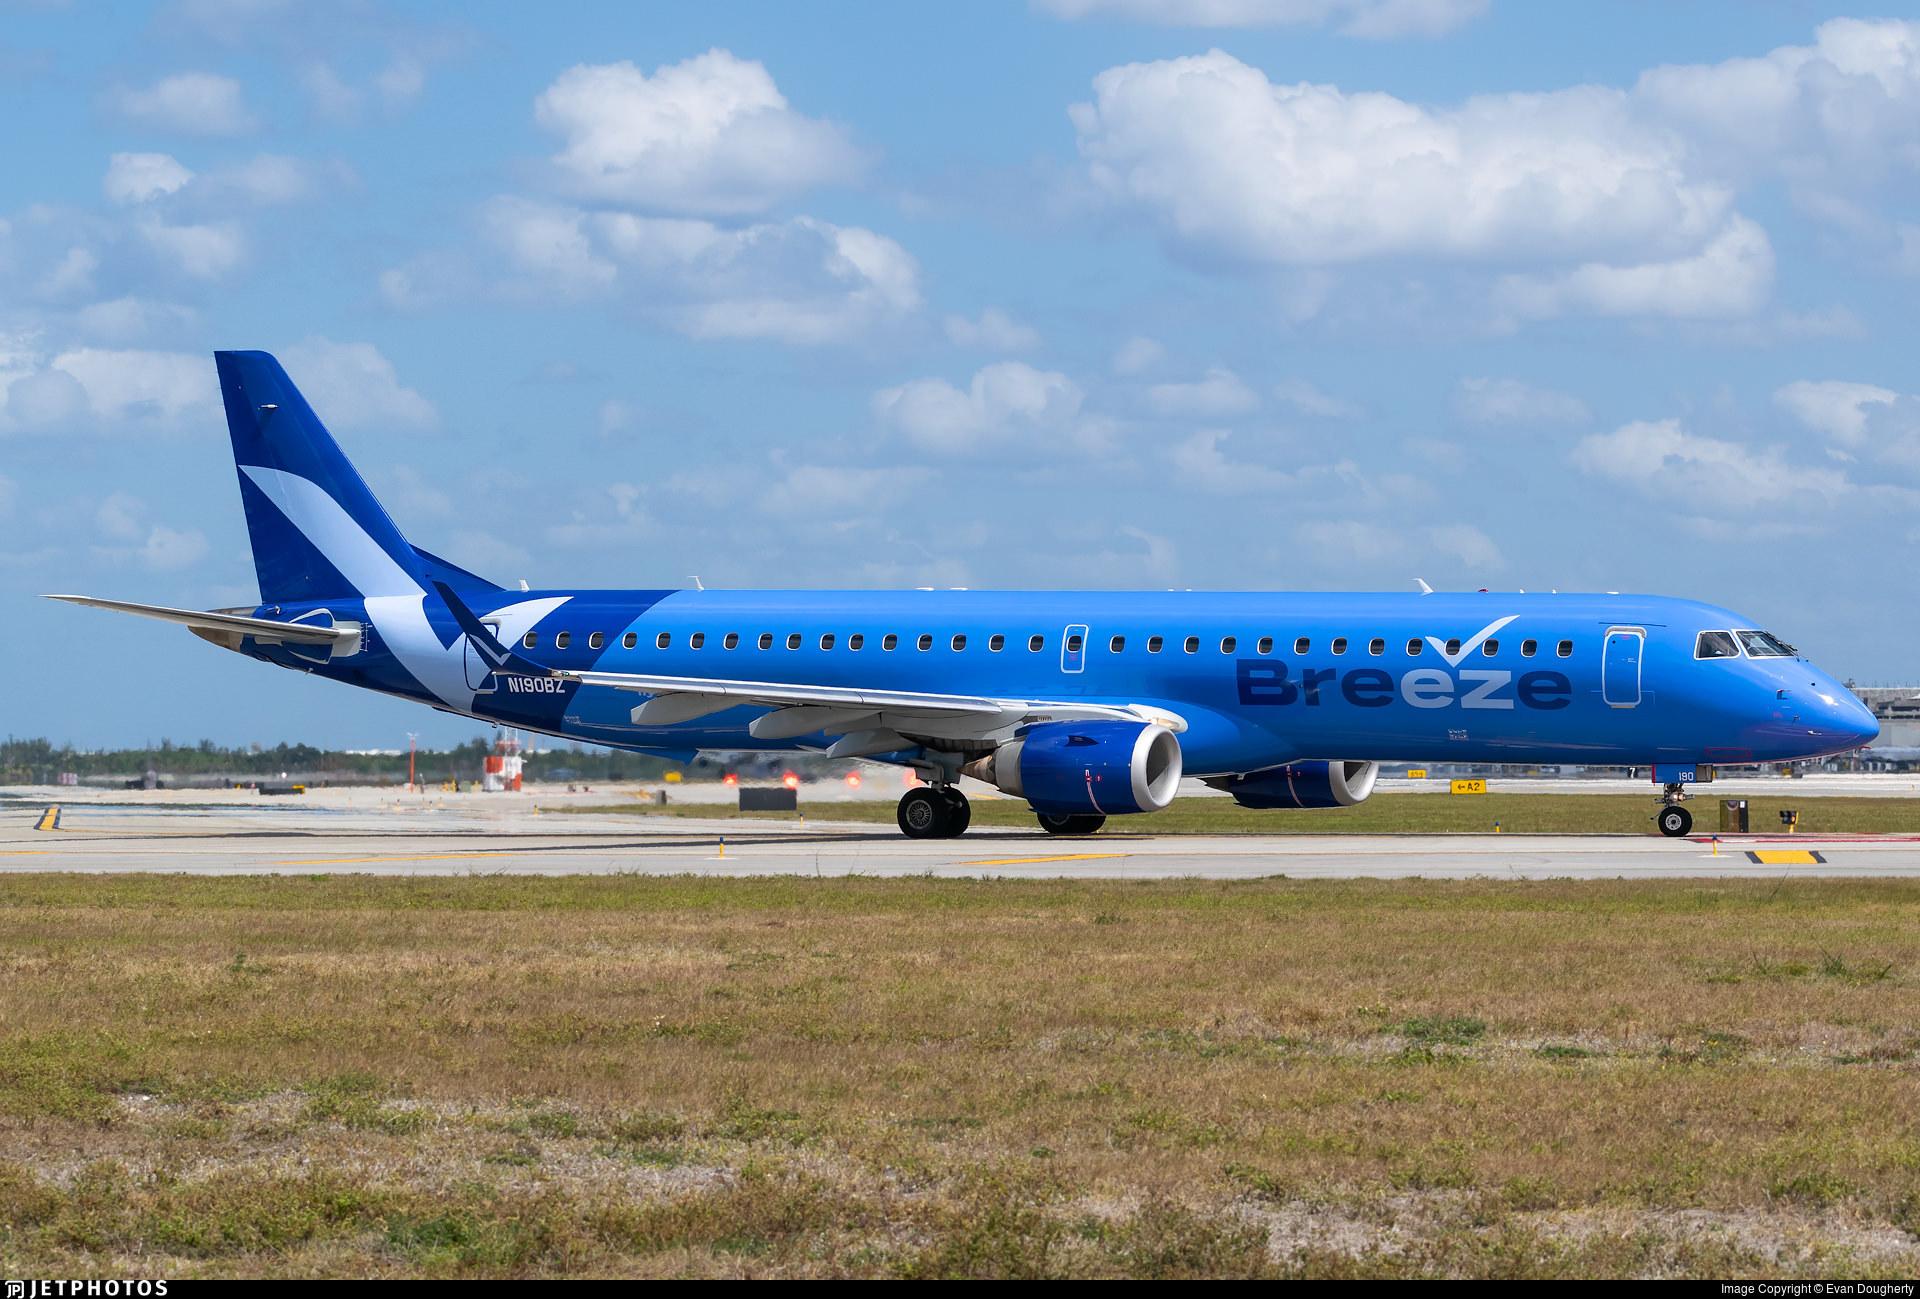 A Breeze Airways E190